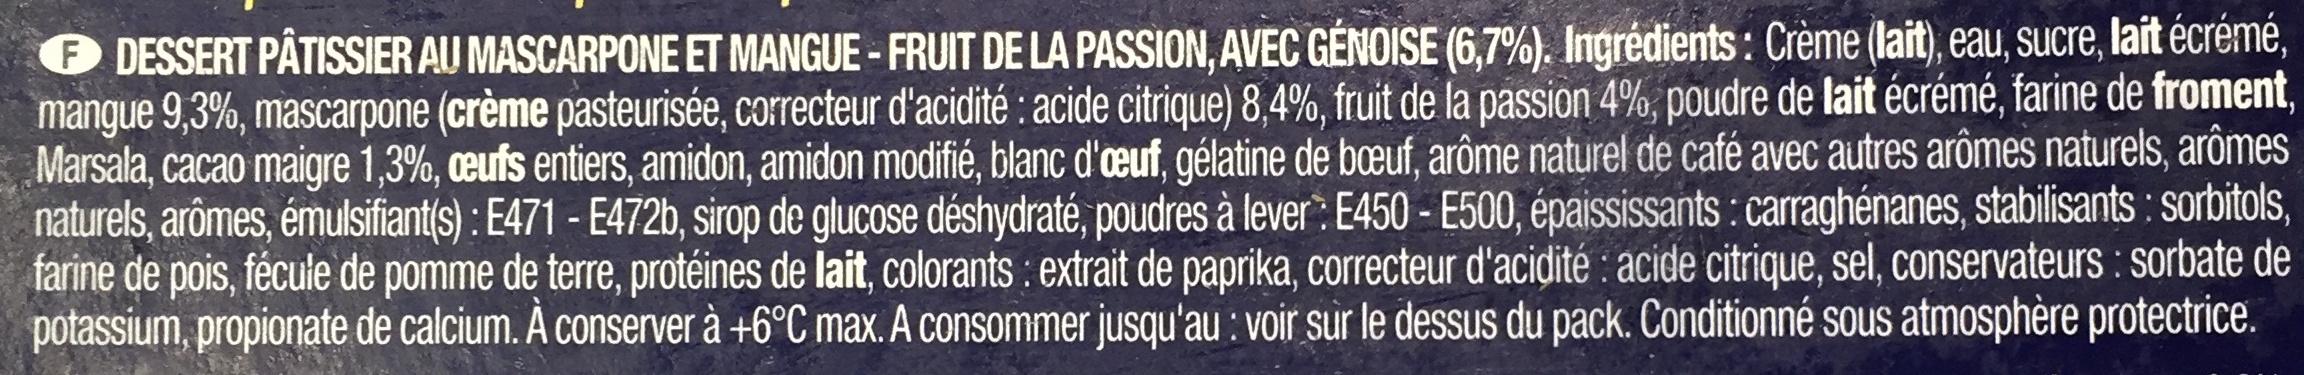 Tiramisu sur lit de mangue & passion - Ingrediënten - fr